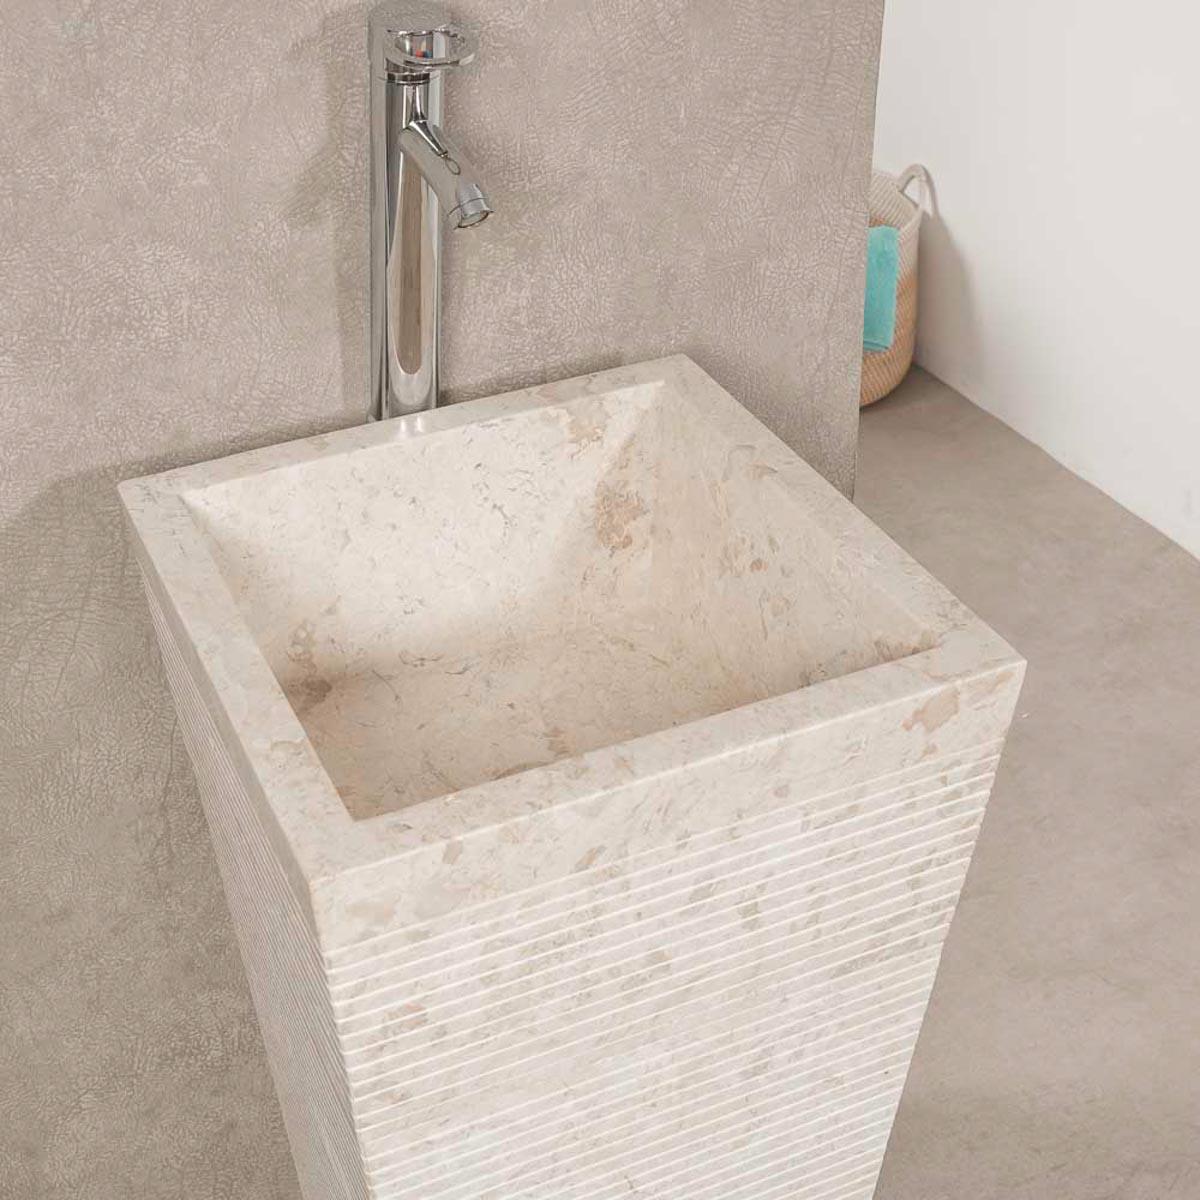 Salle De Bain Ekolux ~ vasque pierre salle de bain belle maison design tarzx com